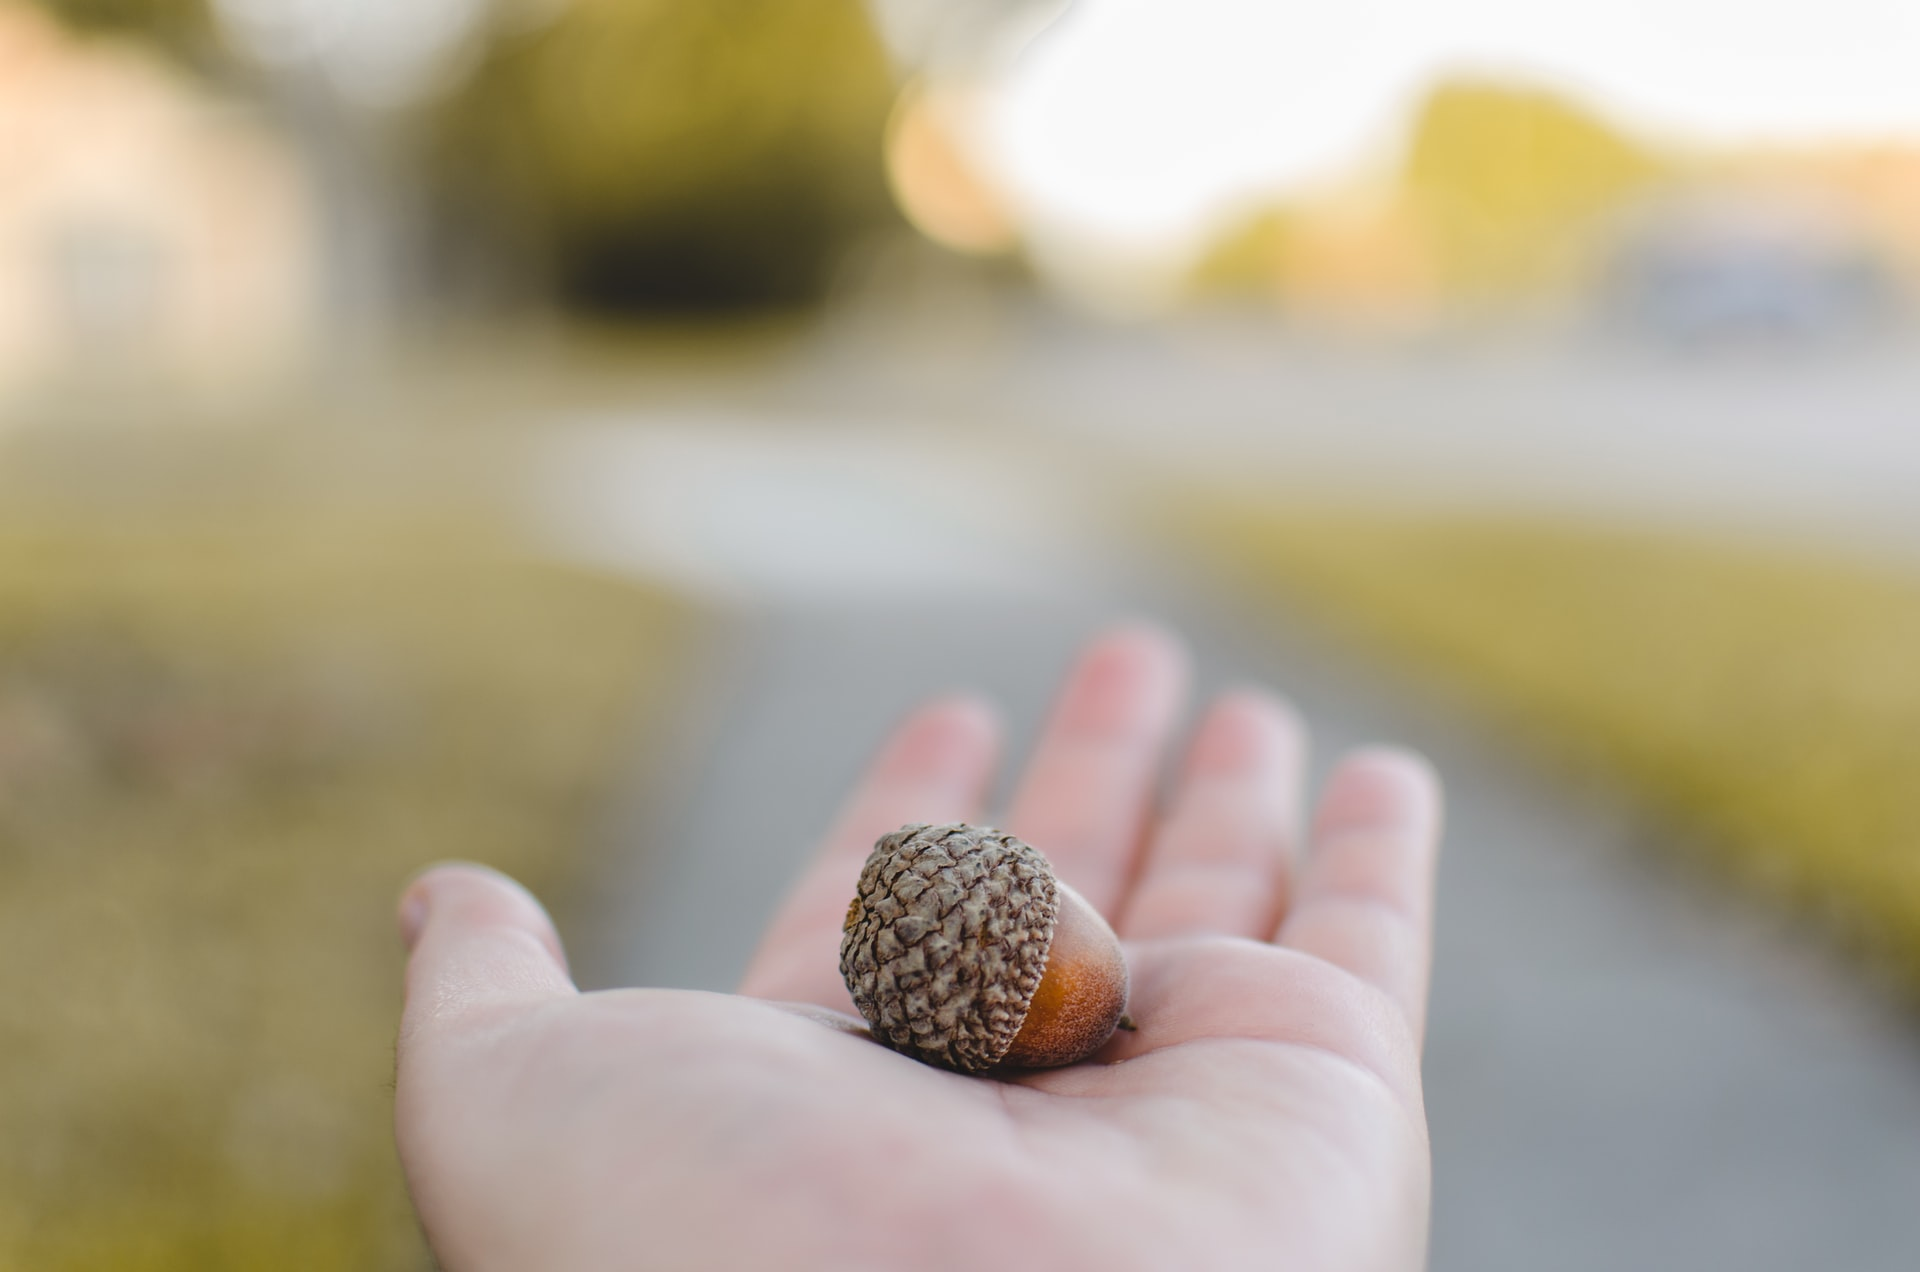 A hand holding an acorn